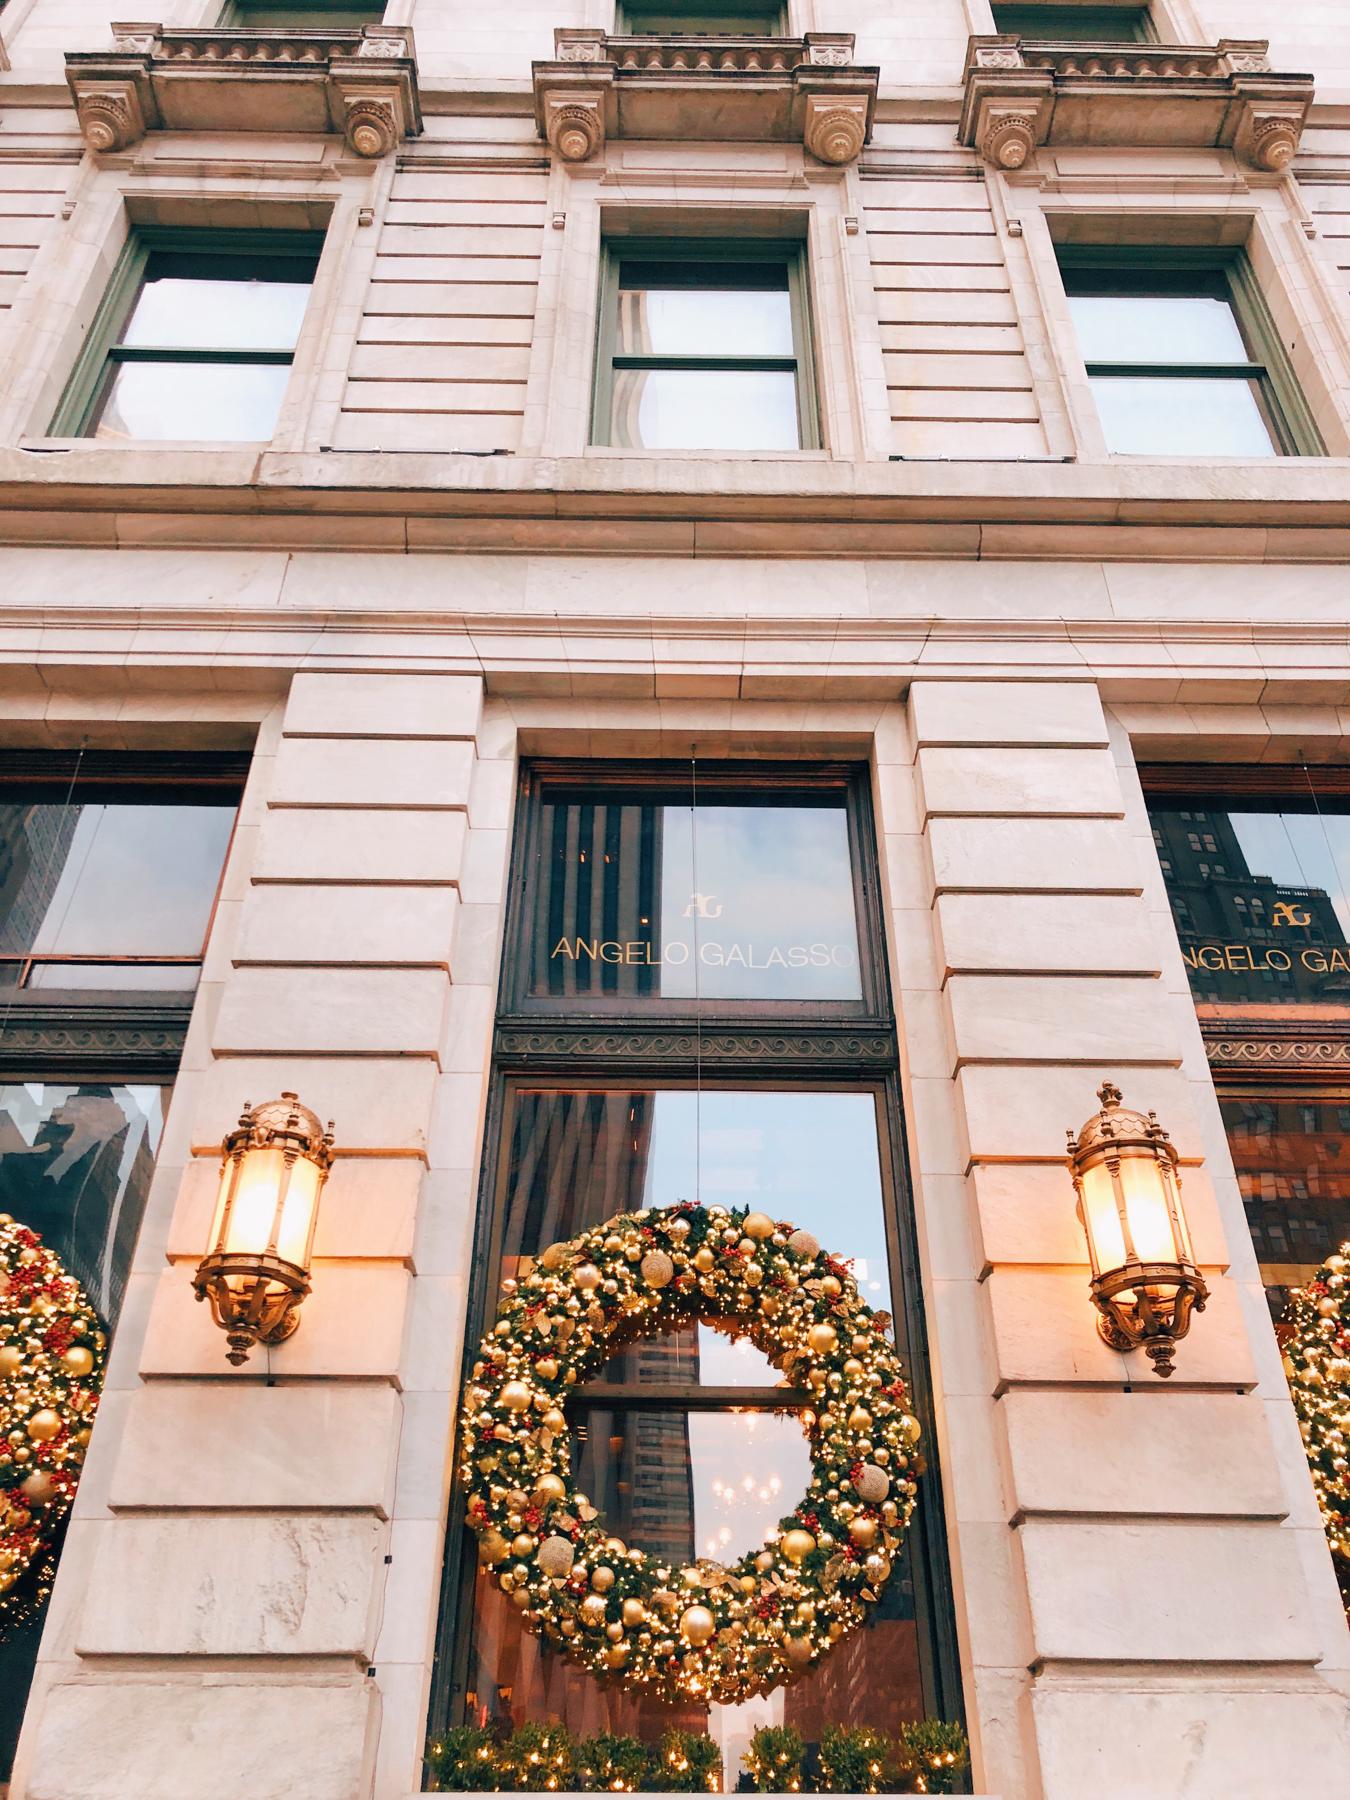 Giant Christmas wreaths on the Plaza Hotel